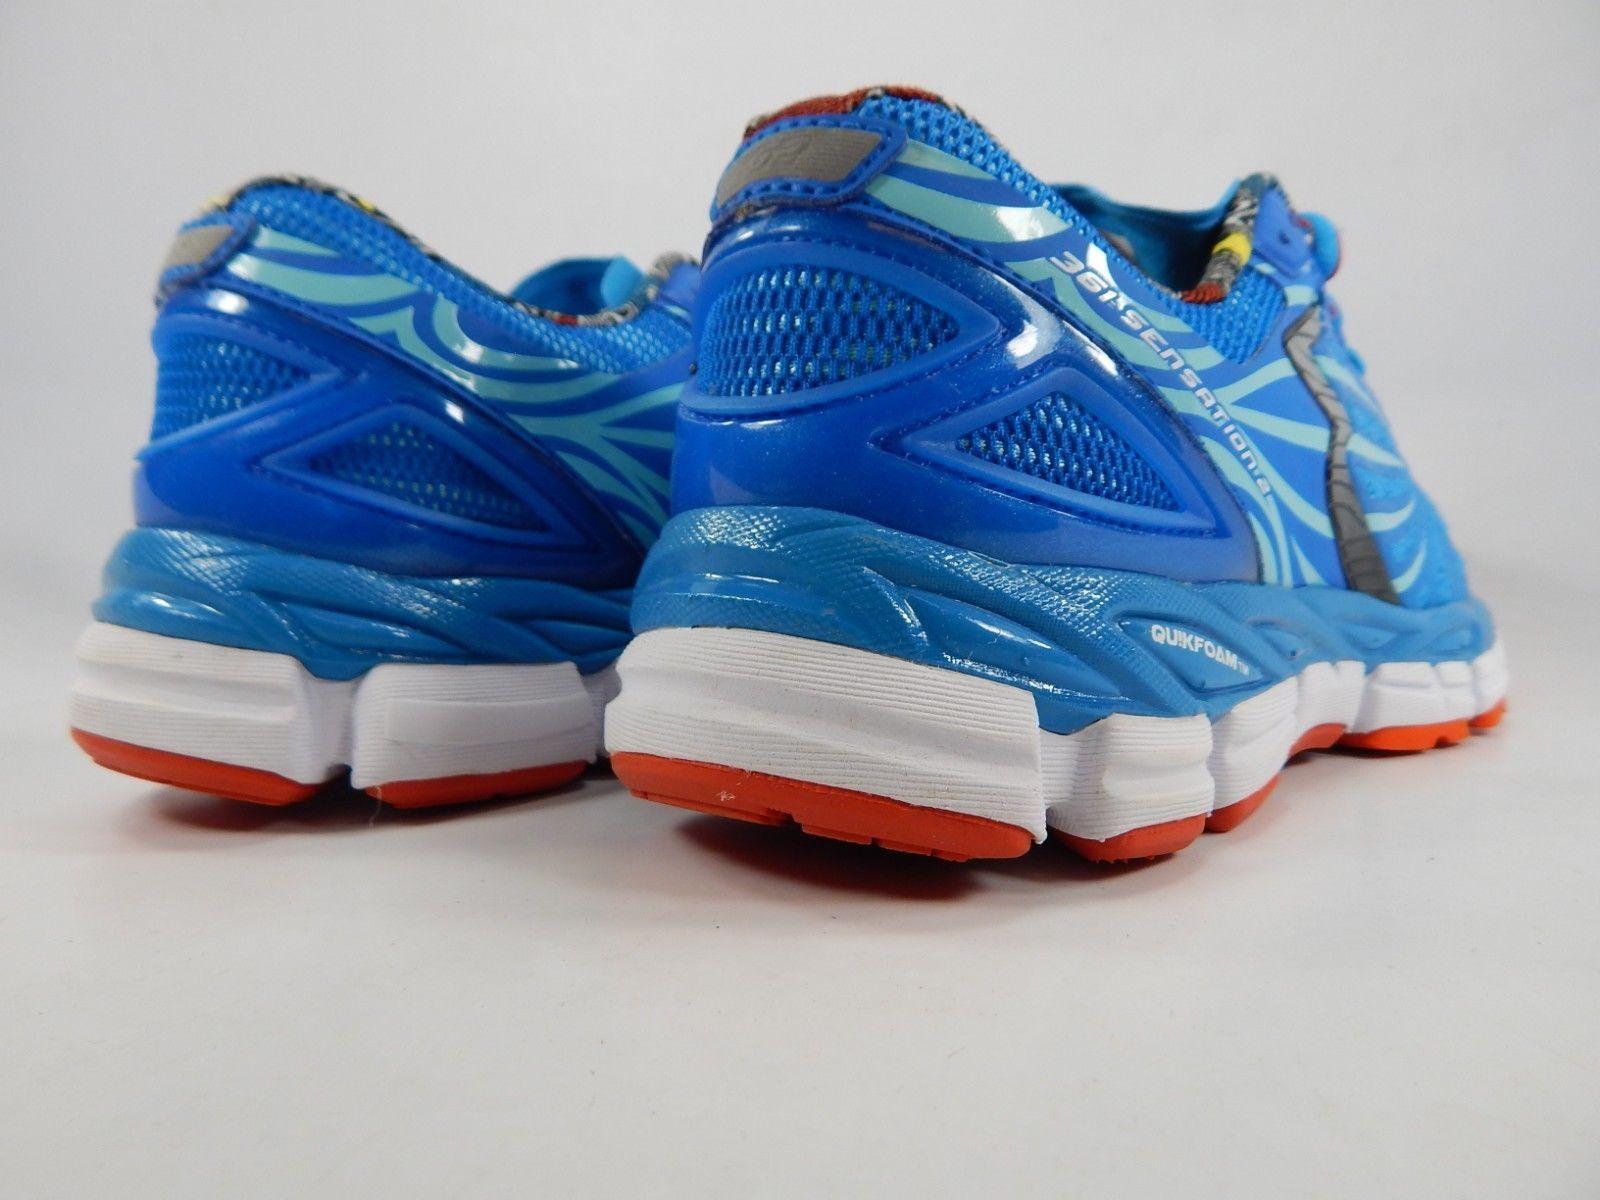 361 Degrees Sensation 2 Size US 10 M (B) EU 42 Women's Running Shoes Y751-5729